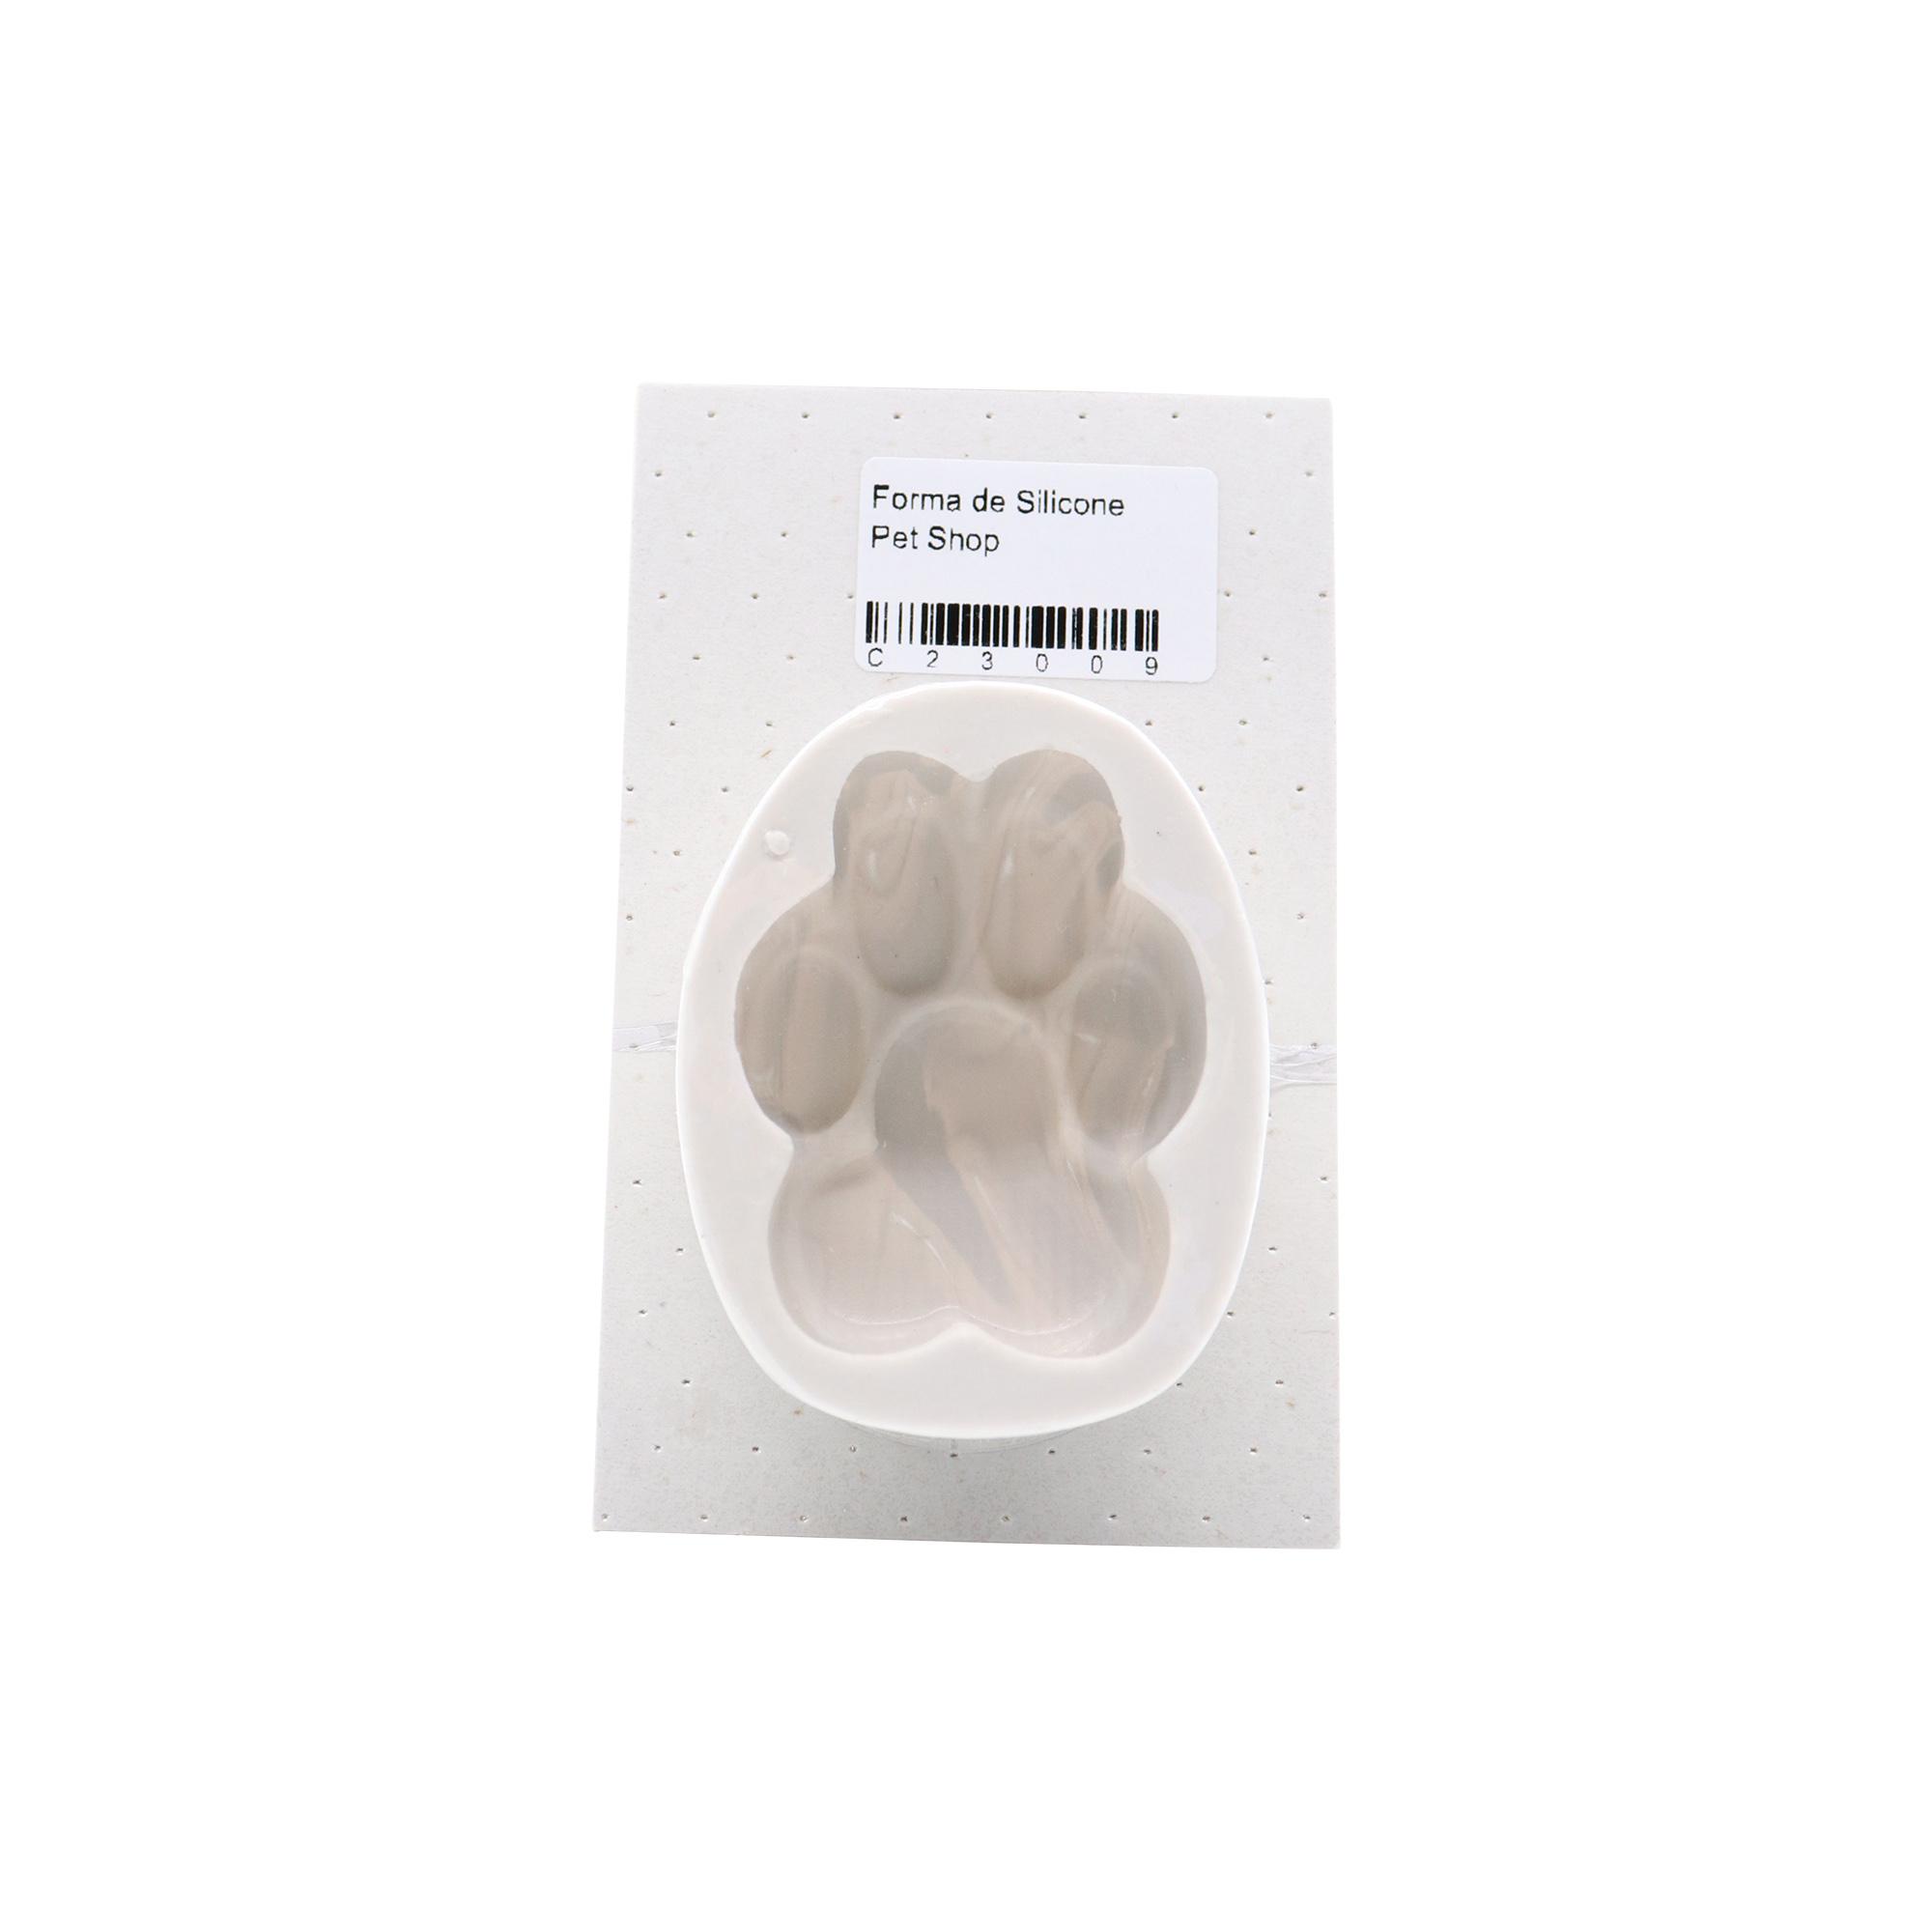 Molde de silicone pet shop